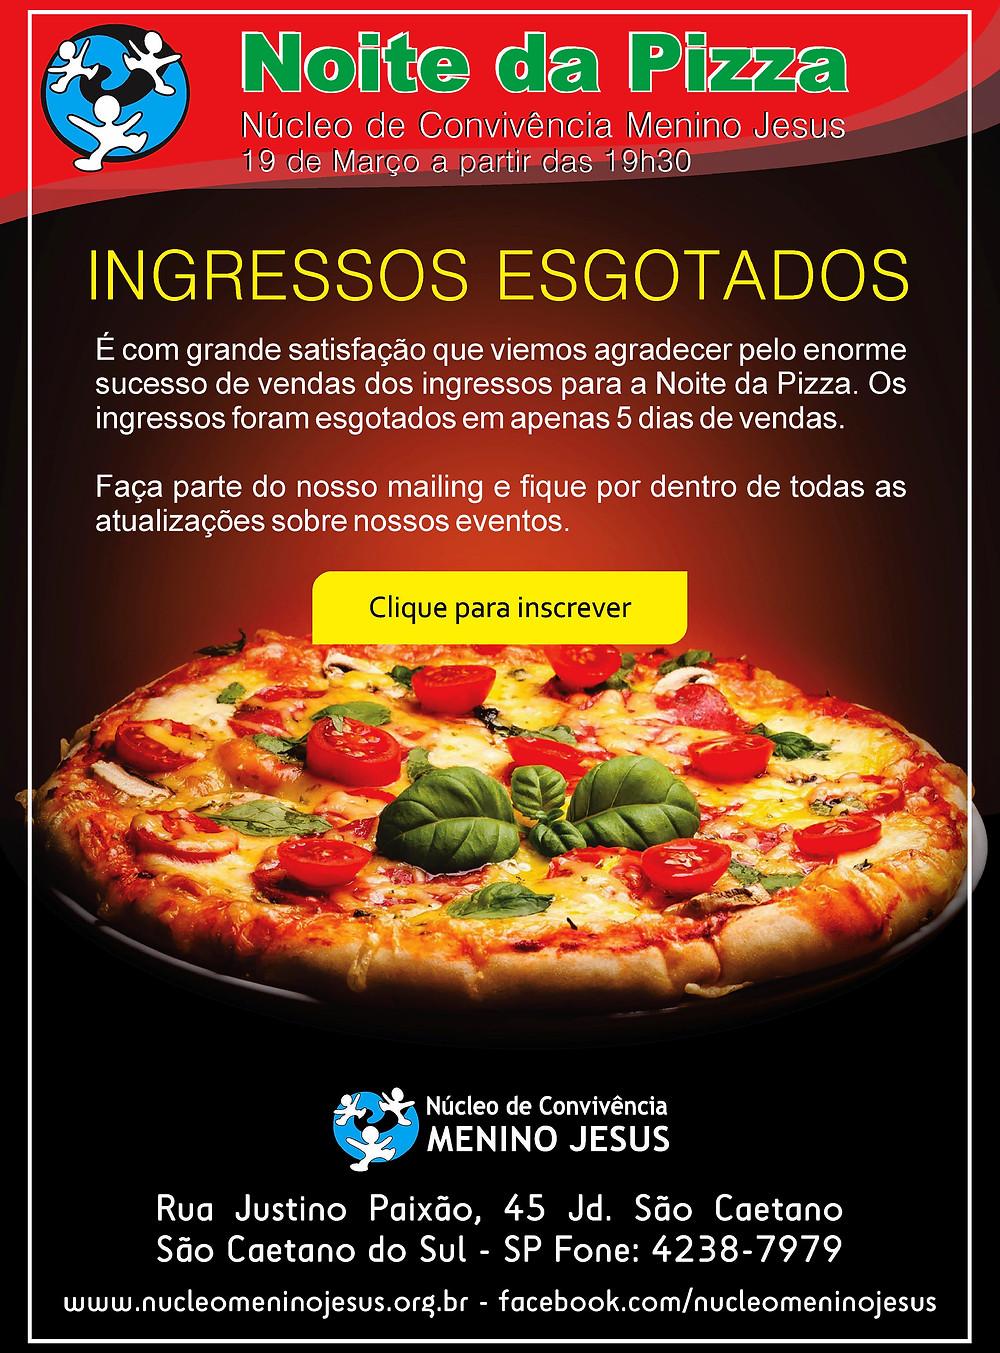 Noite da Pizza 2015 - Núcleo de Convivência Menino Jesus